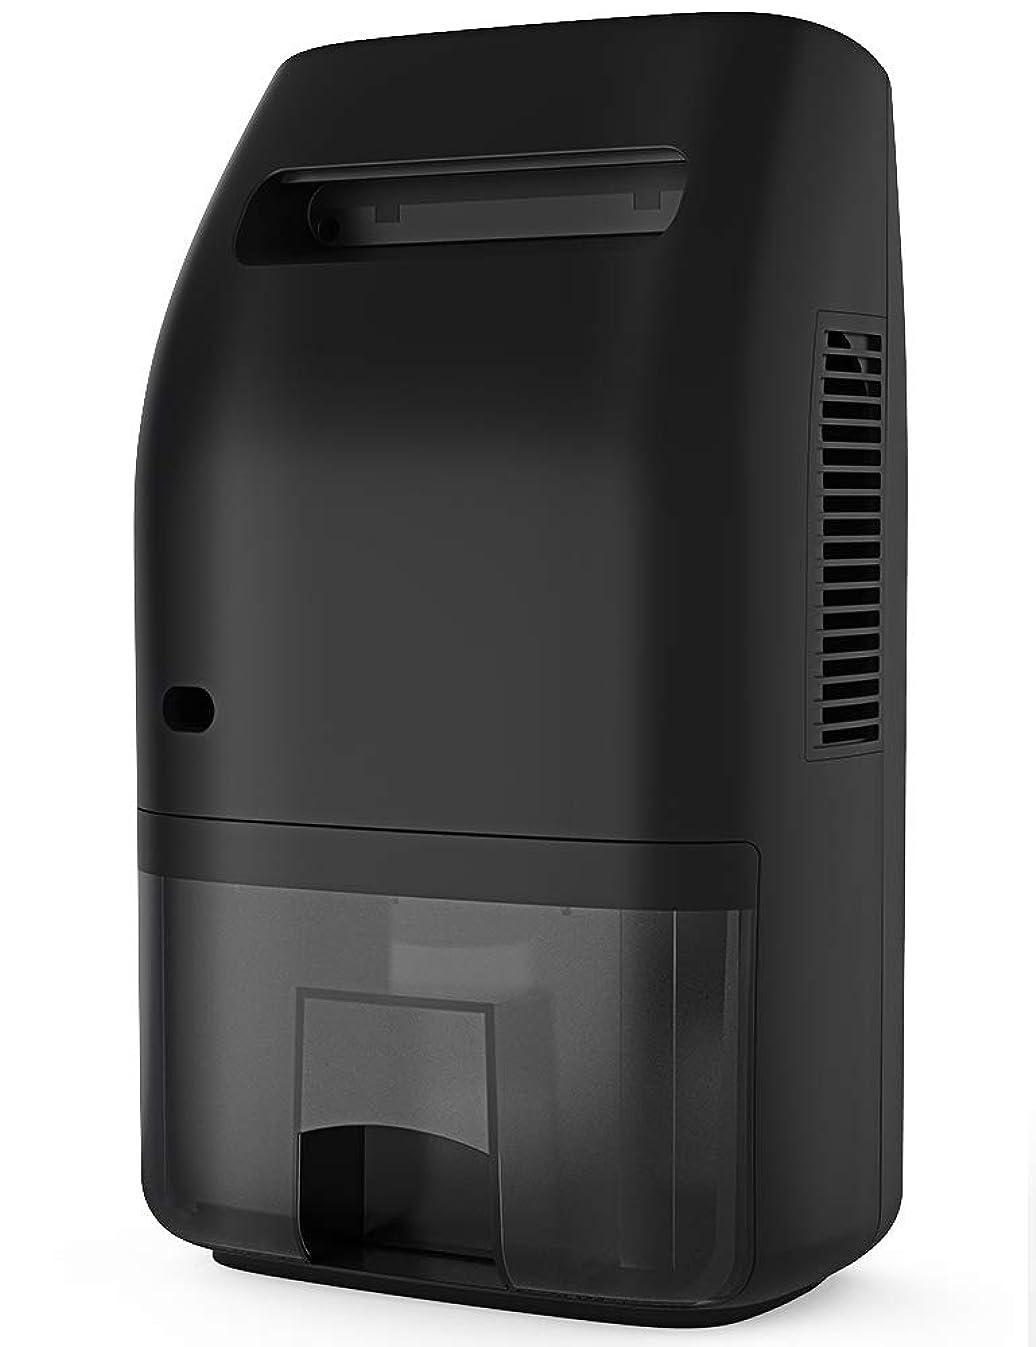 Afloia Dehumidifier for Home 2000ML(68 oz) Water Tank, Portable Quiet Dehumidifier 2200 Cubic Feet(269 sq.ft) Home Electric Dehumidifiers for Bathroom Space Bedroom Kitchen Caravan Office (Dark)